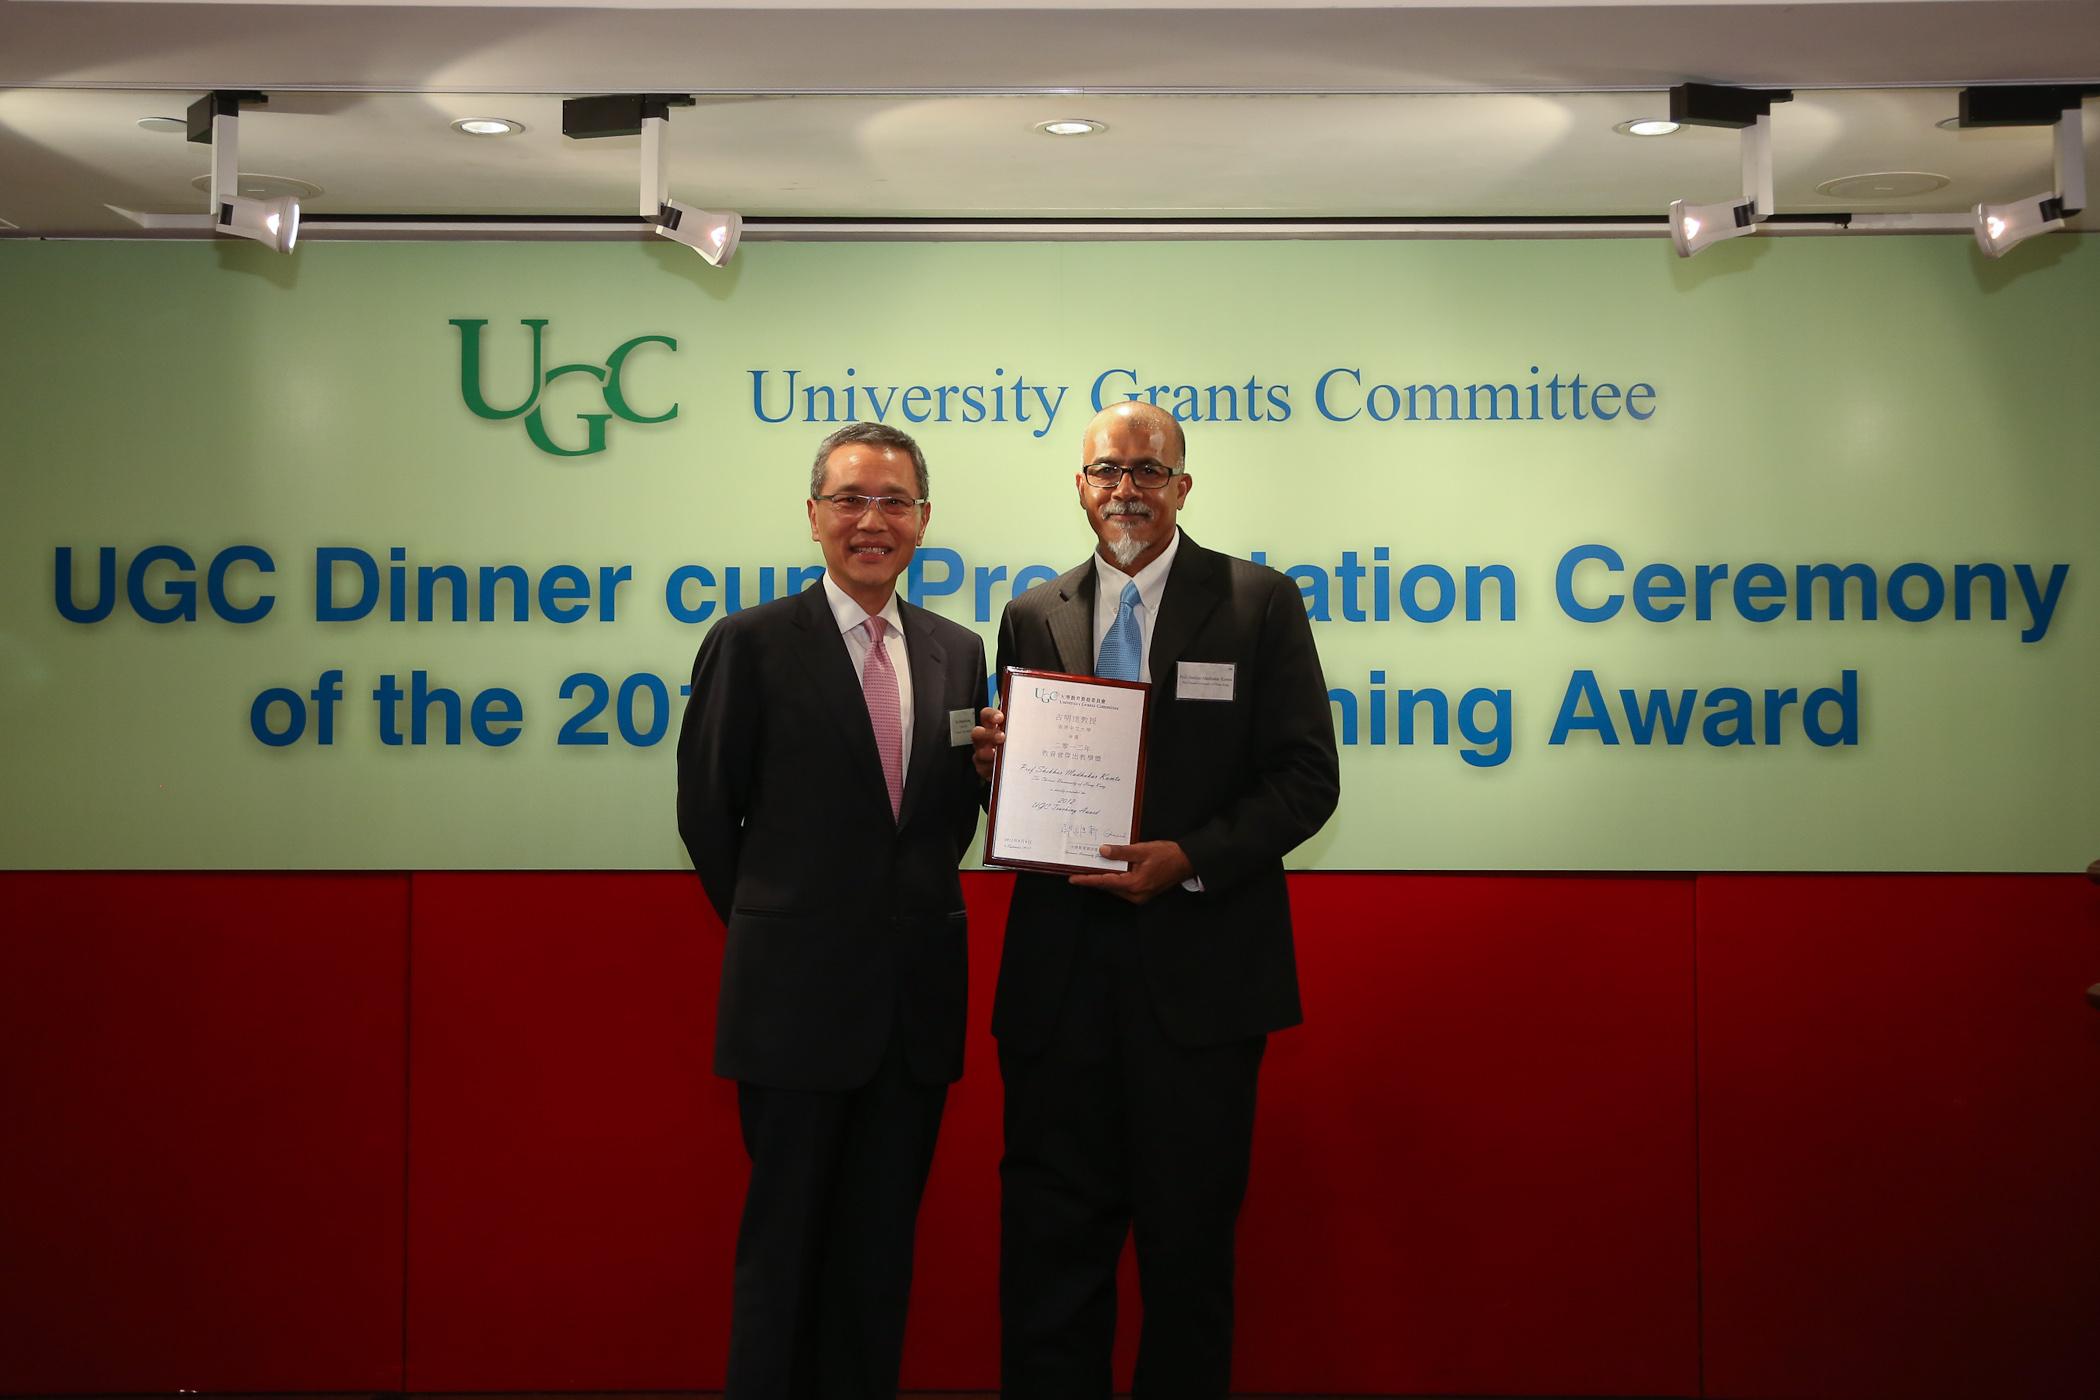 Mr. Edward Cheng, UGC Chairman presents the award to Professor Kumta